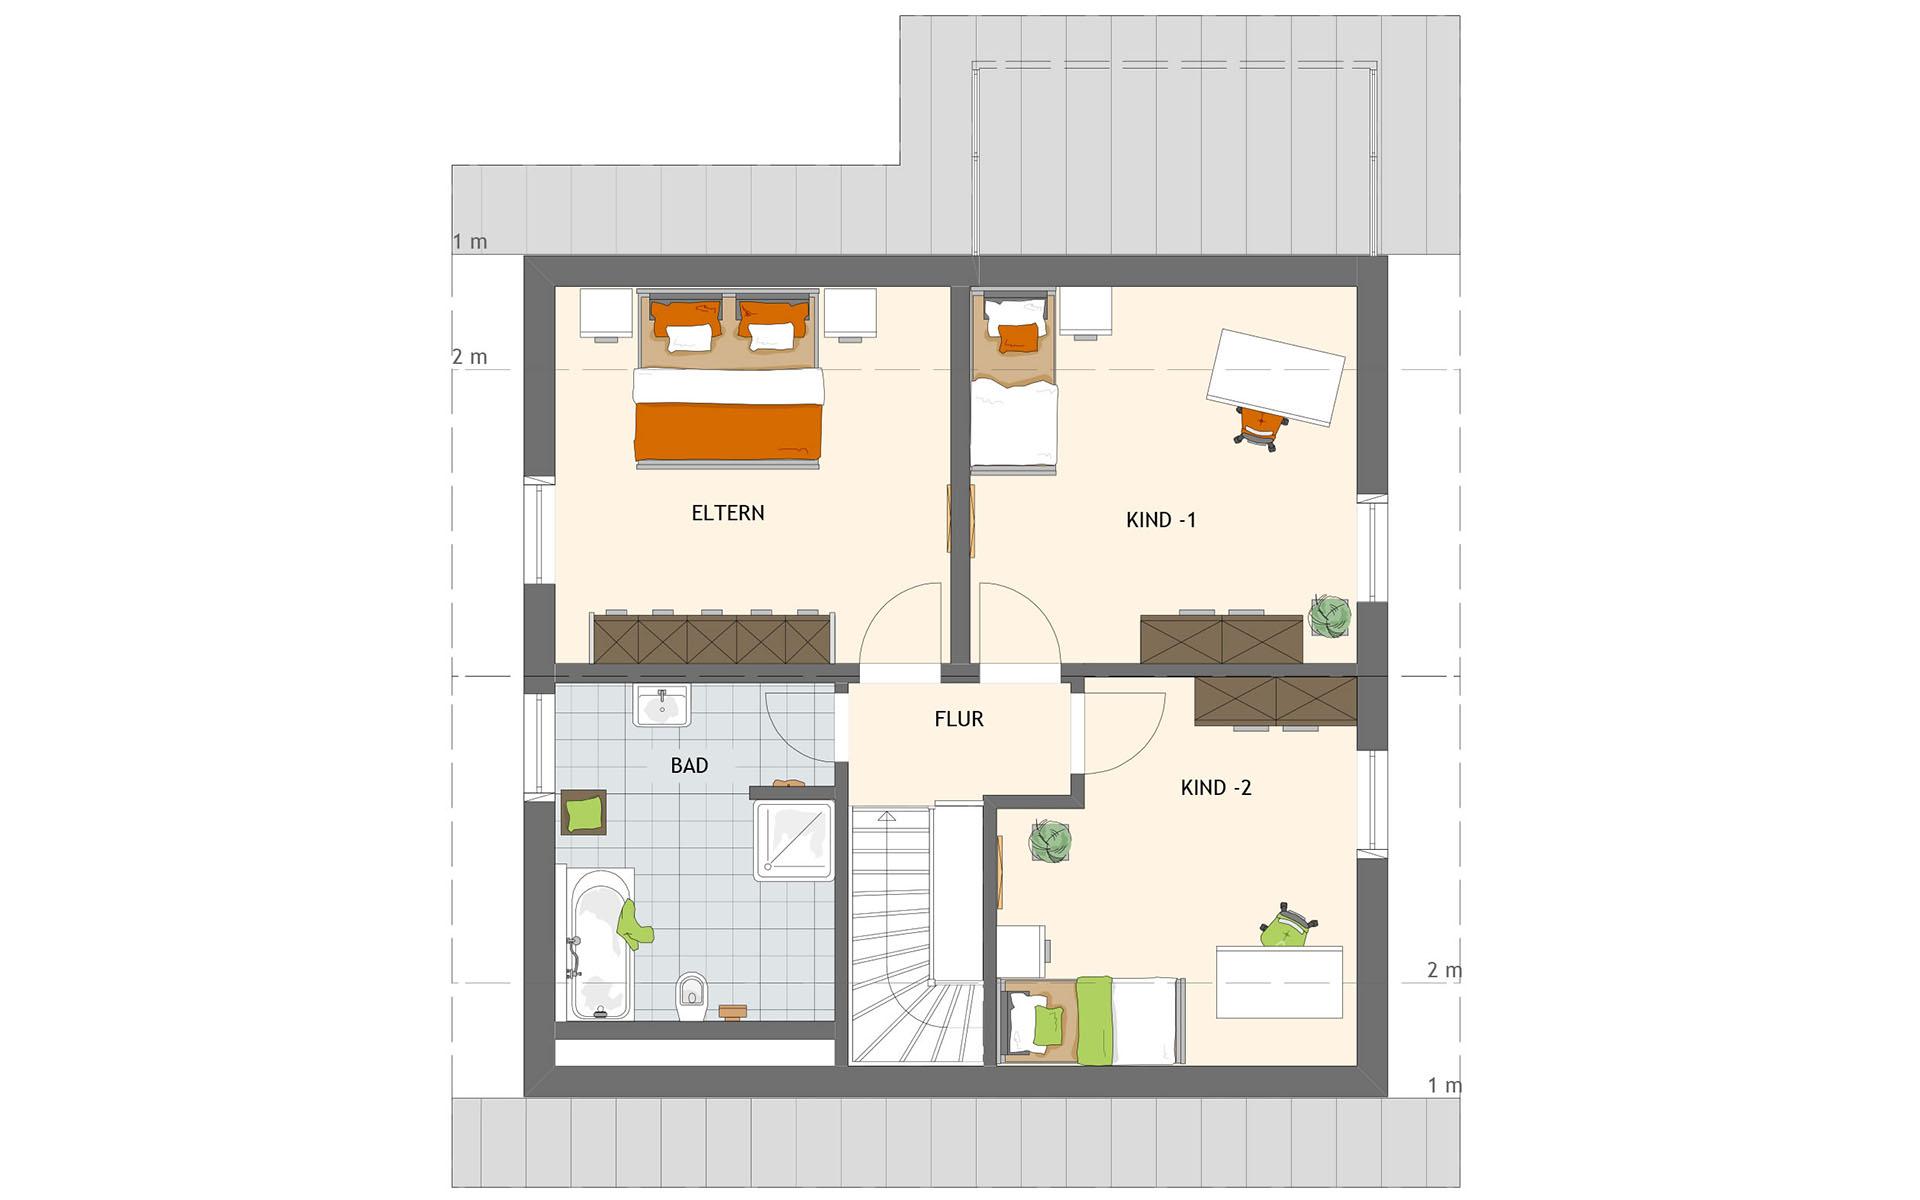 Dachgeschoss VIO 200 S130 WG von FingerHaus GmbH